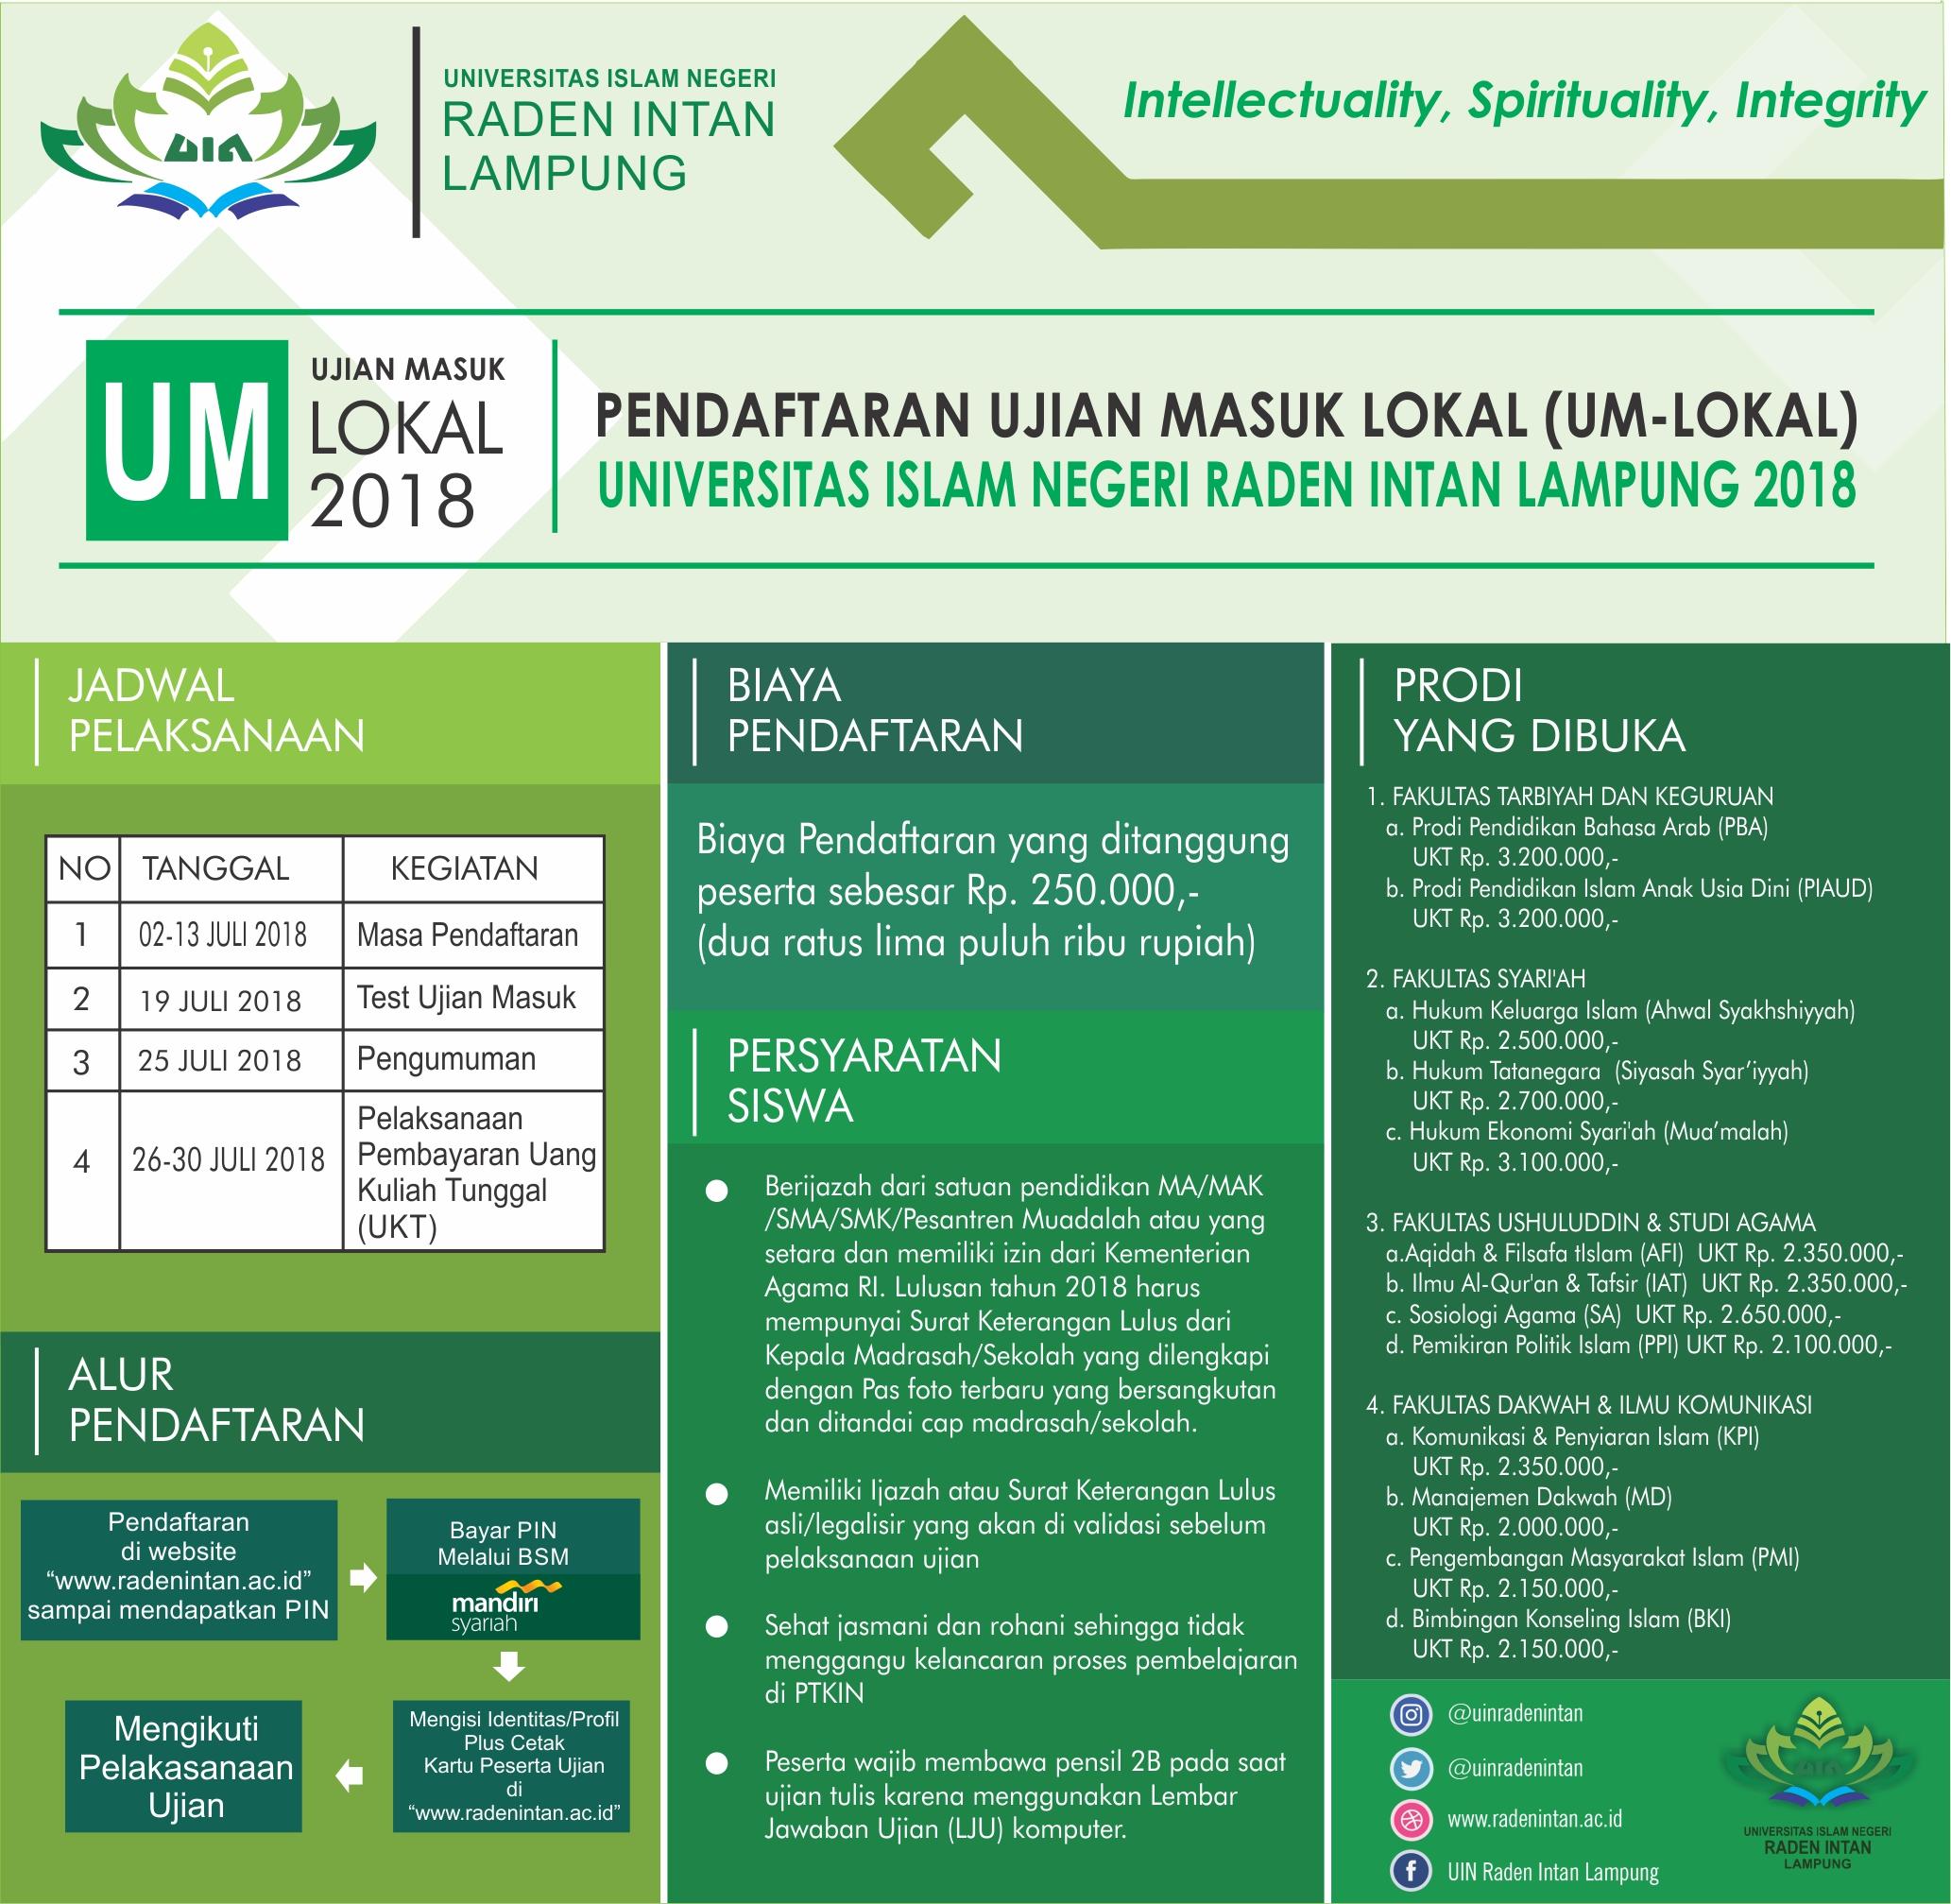 Semua Announcement Universitas Islam Negeri Raden Intan Lampung Uin Raden Intan Lampung